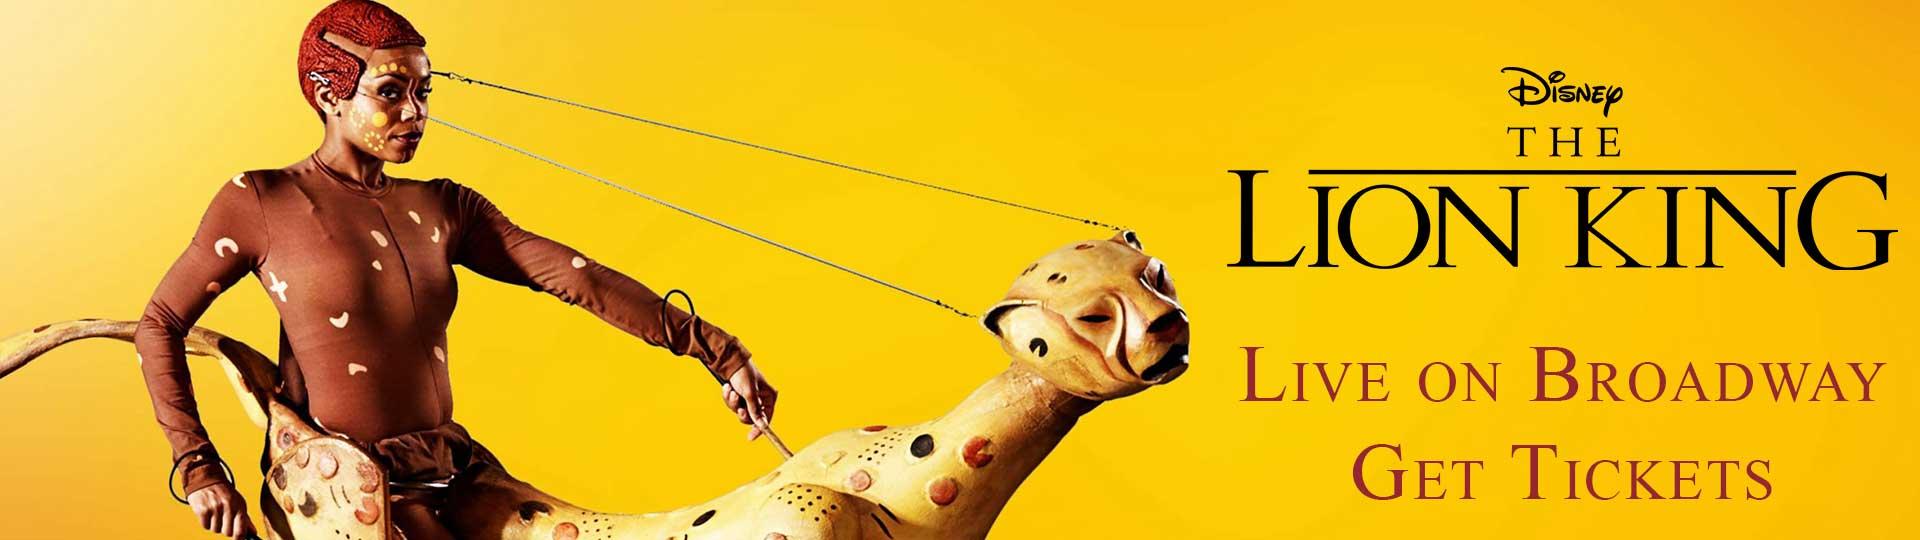 Lion King on Broadway advertisement